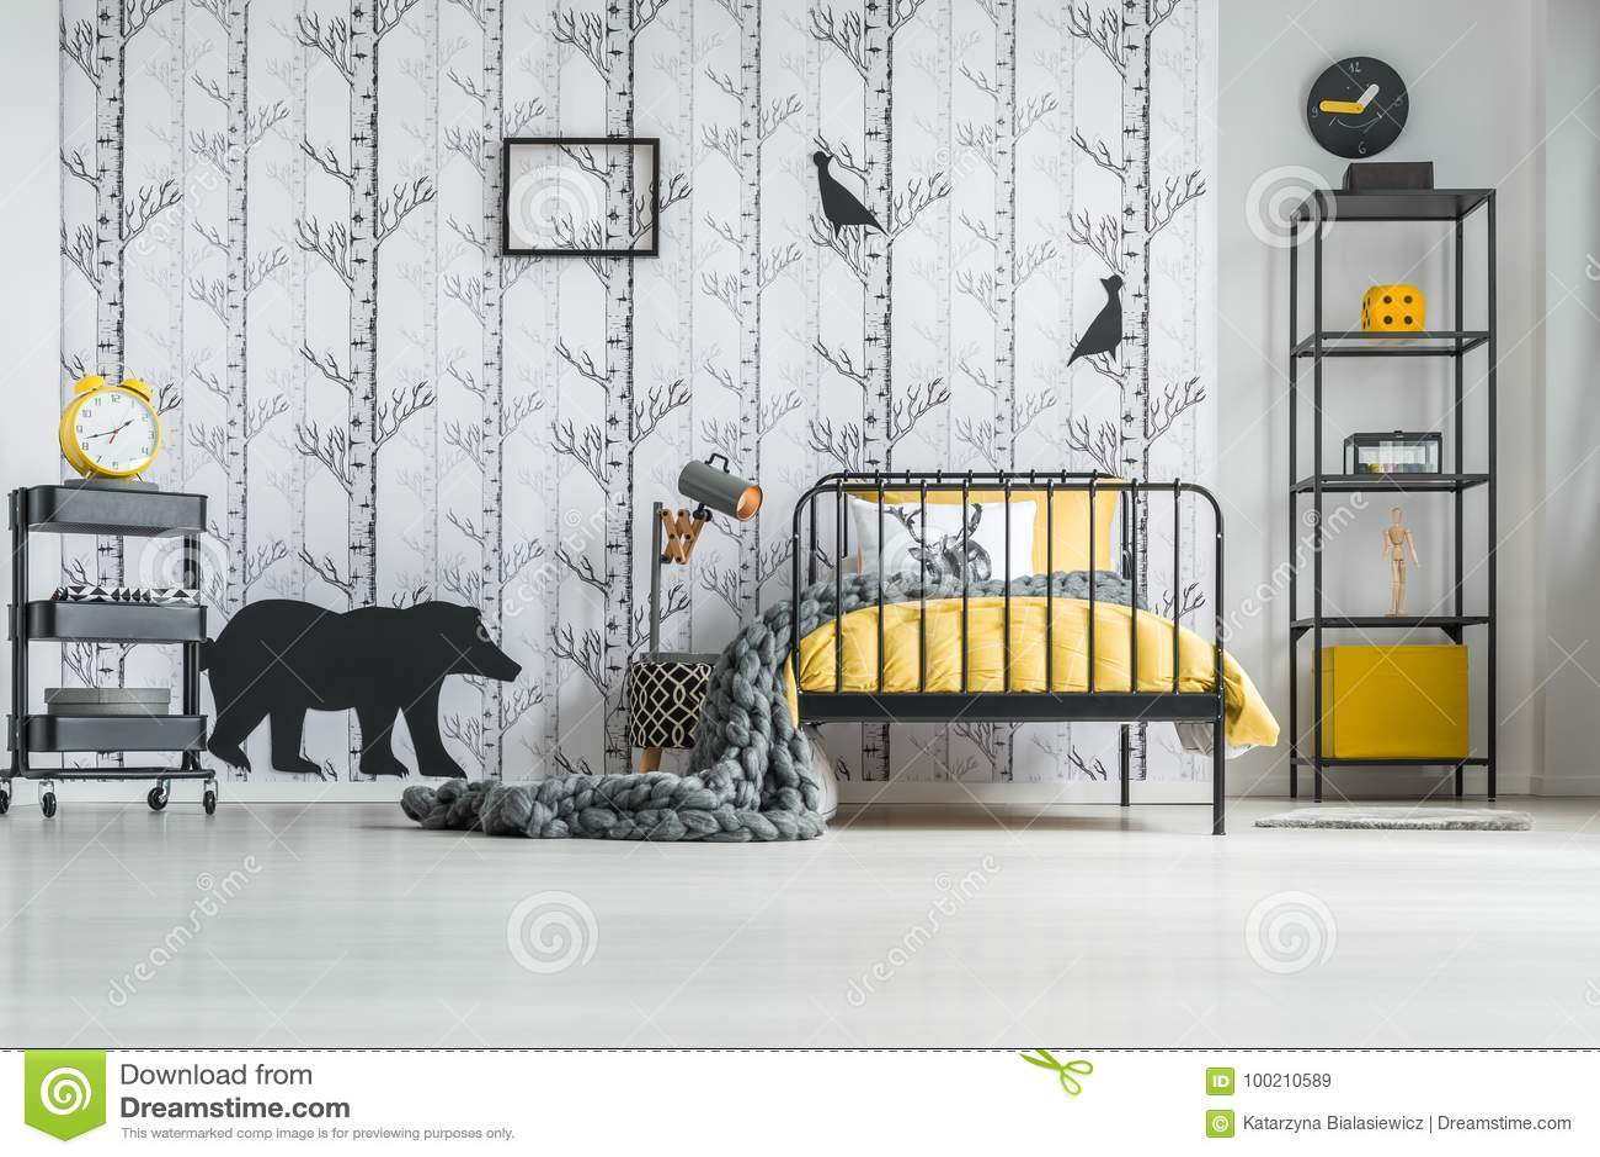 White Bedroom With Yellow Clock Stock Image - Image of shelf ...